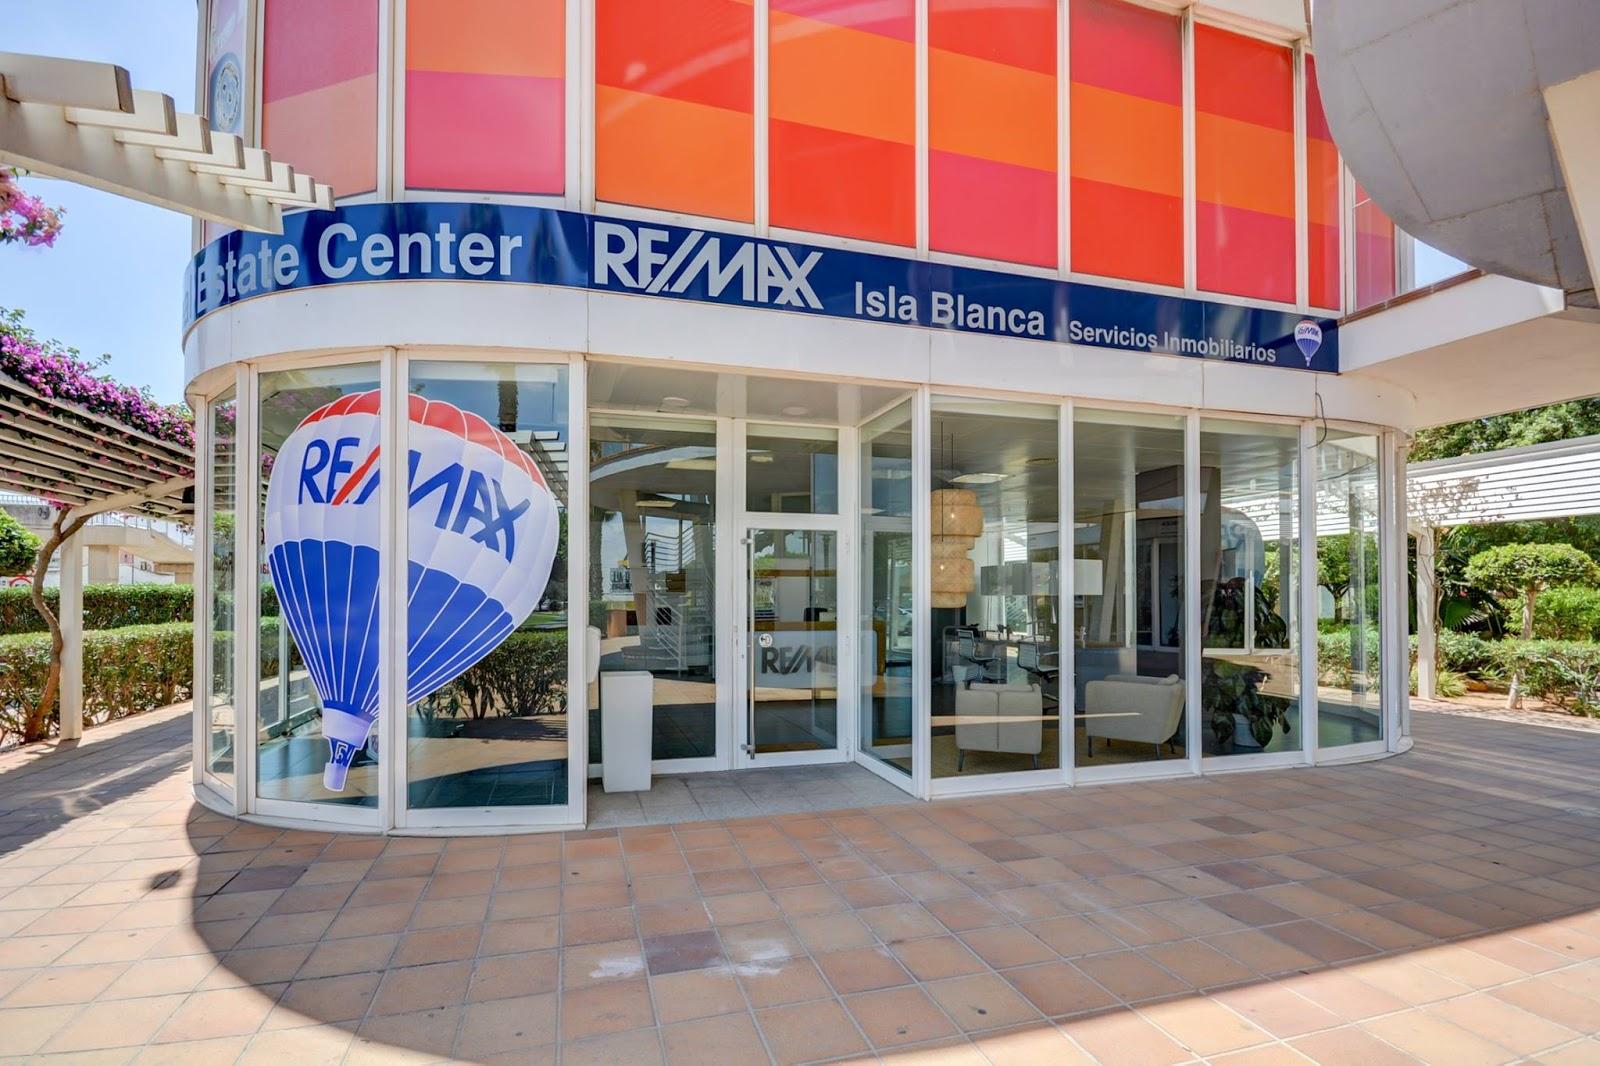 Asociate a remax diciembre 2017 for Oficina del consumidor ibiza